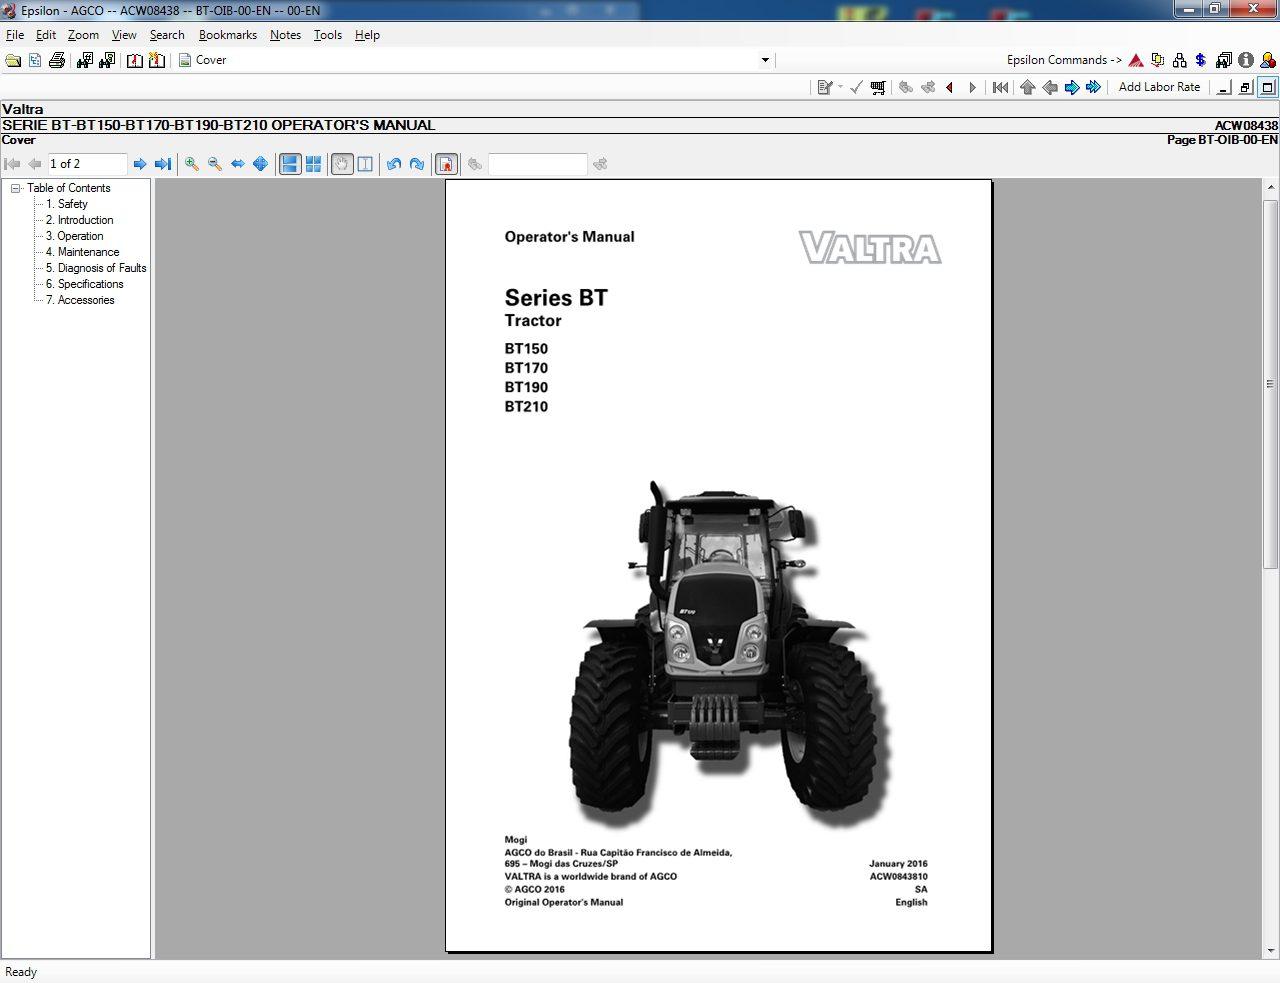 Valtra_SA_AG_South_America_112019_Part_Book_Workshop_Service_Manuals_2